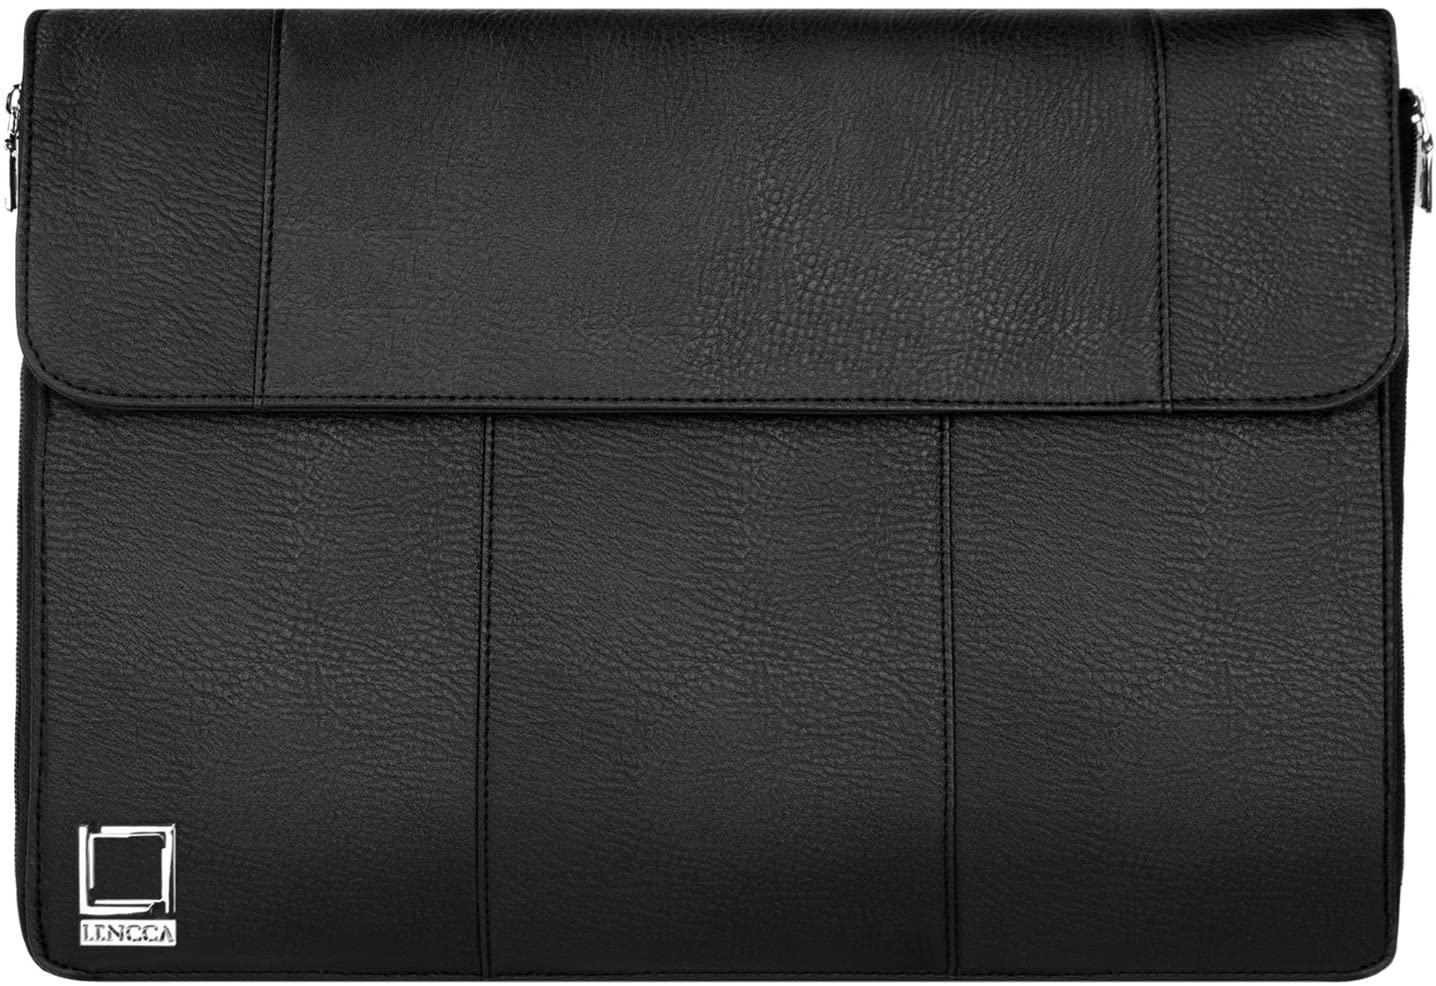 Lencca Axis 15 Slim Compact Laptop Briefcase Crossbody Shoulder Bag for Dell Inspiron 14 15, Latitude 14 15, Precision 15, Precision Mobile Workstation, XPS 15 Series 14, 15.6 inch Laptop